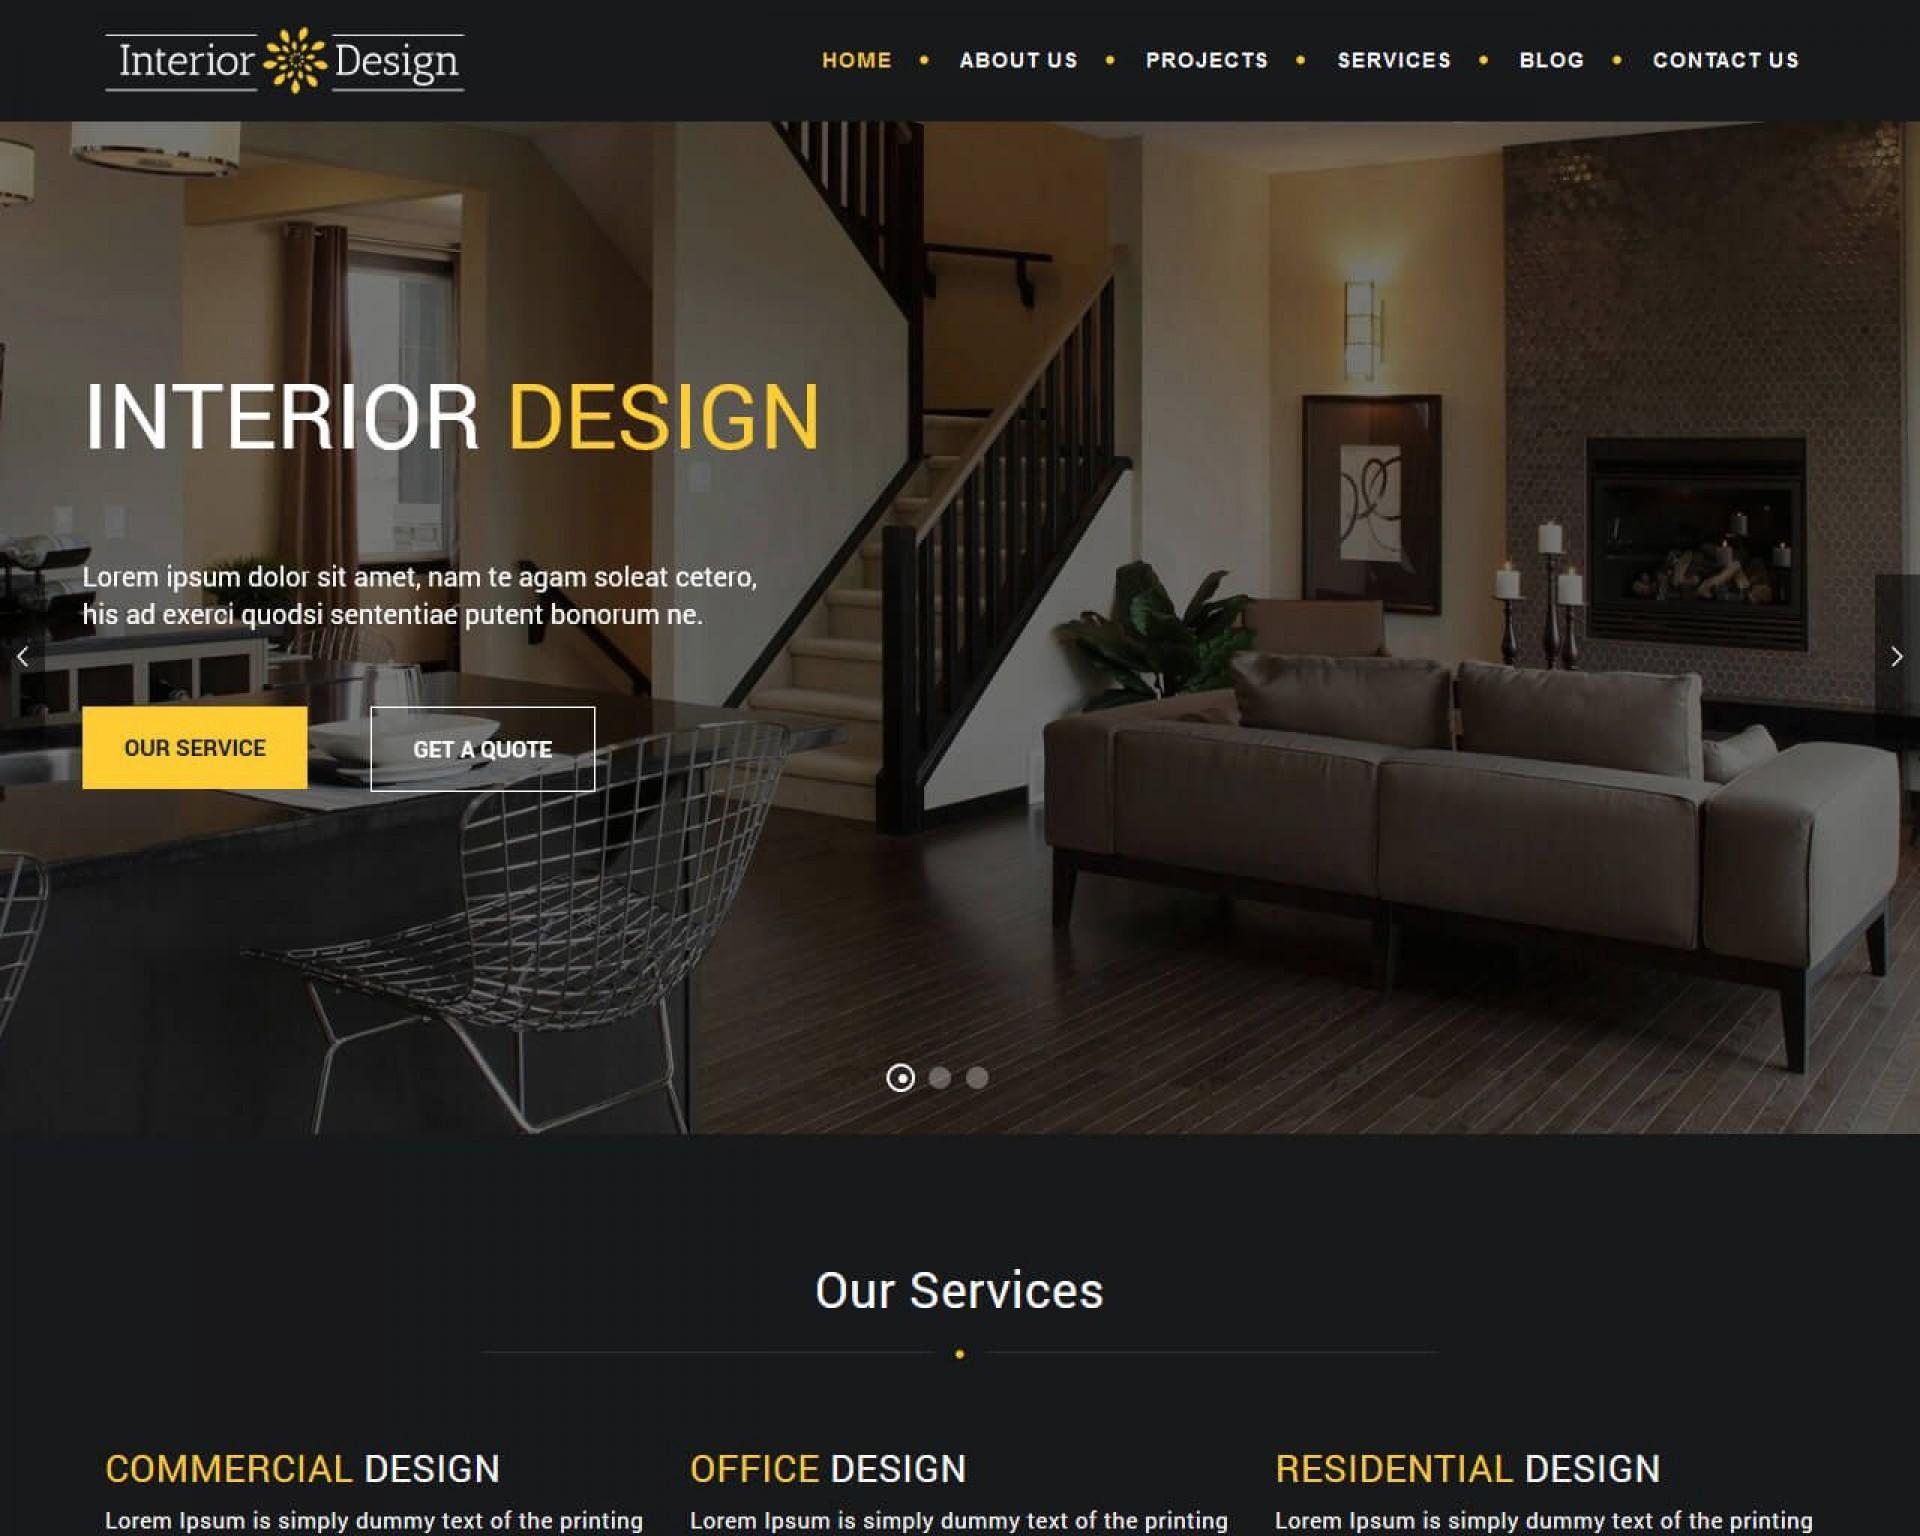 007 Sensational Interior Design Html Template Free Idea  Download1920